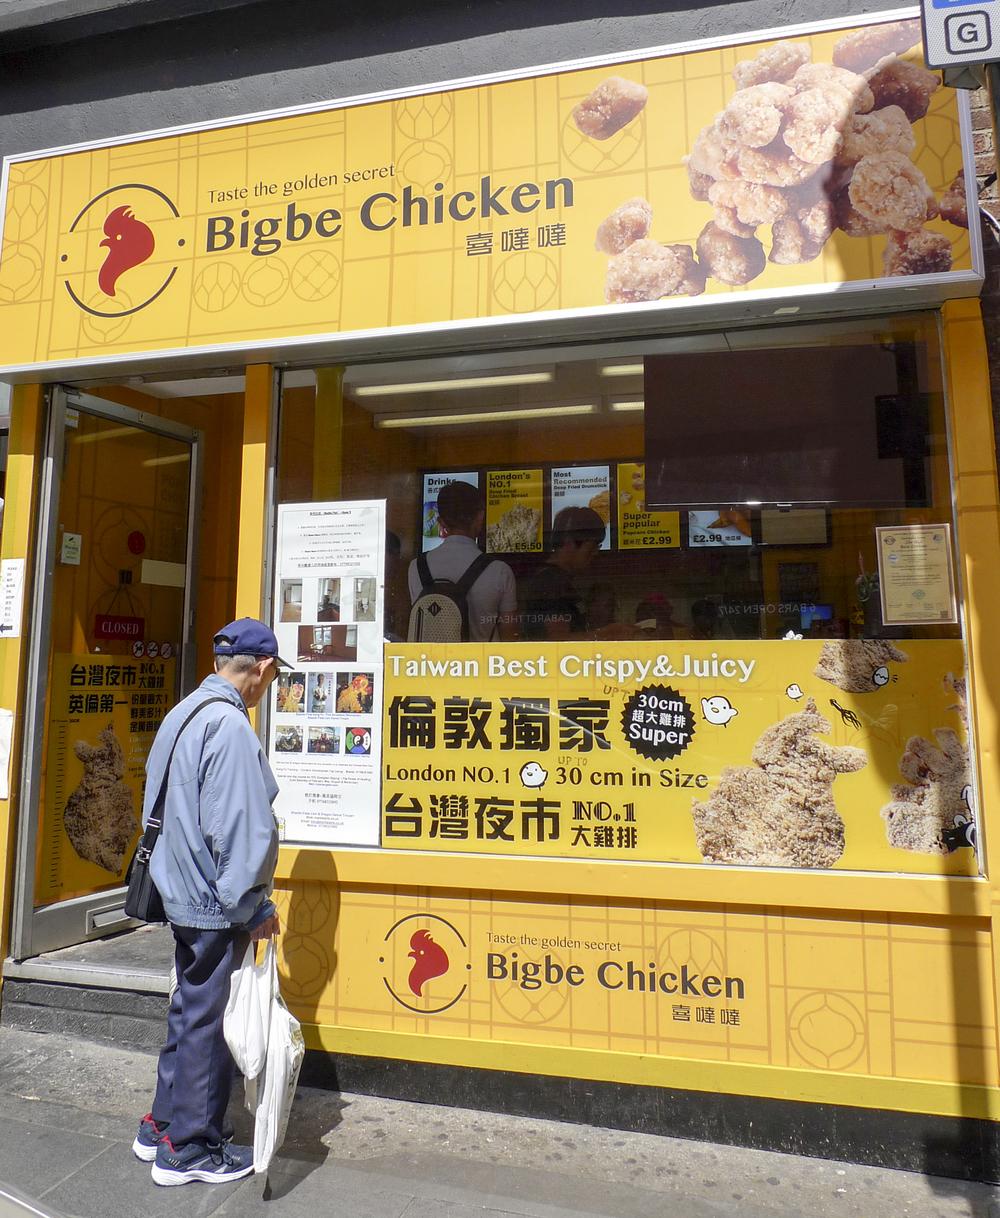 Bigbe Chicken in Chinatown